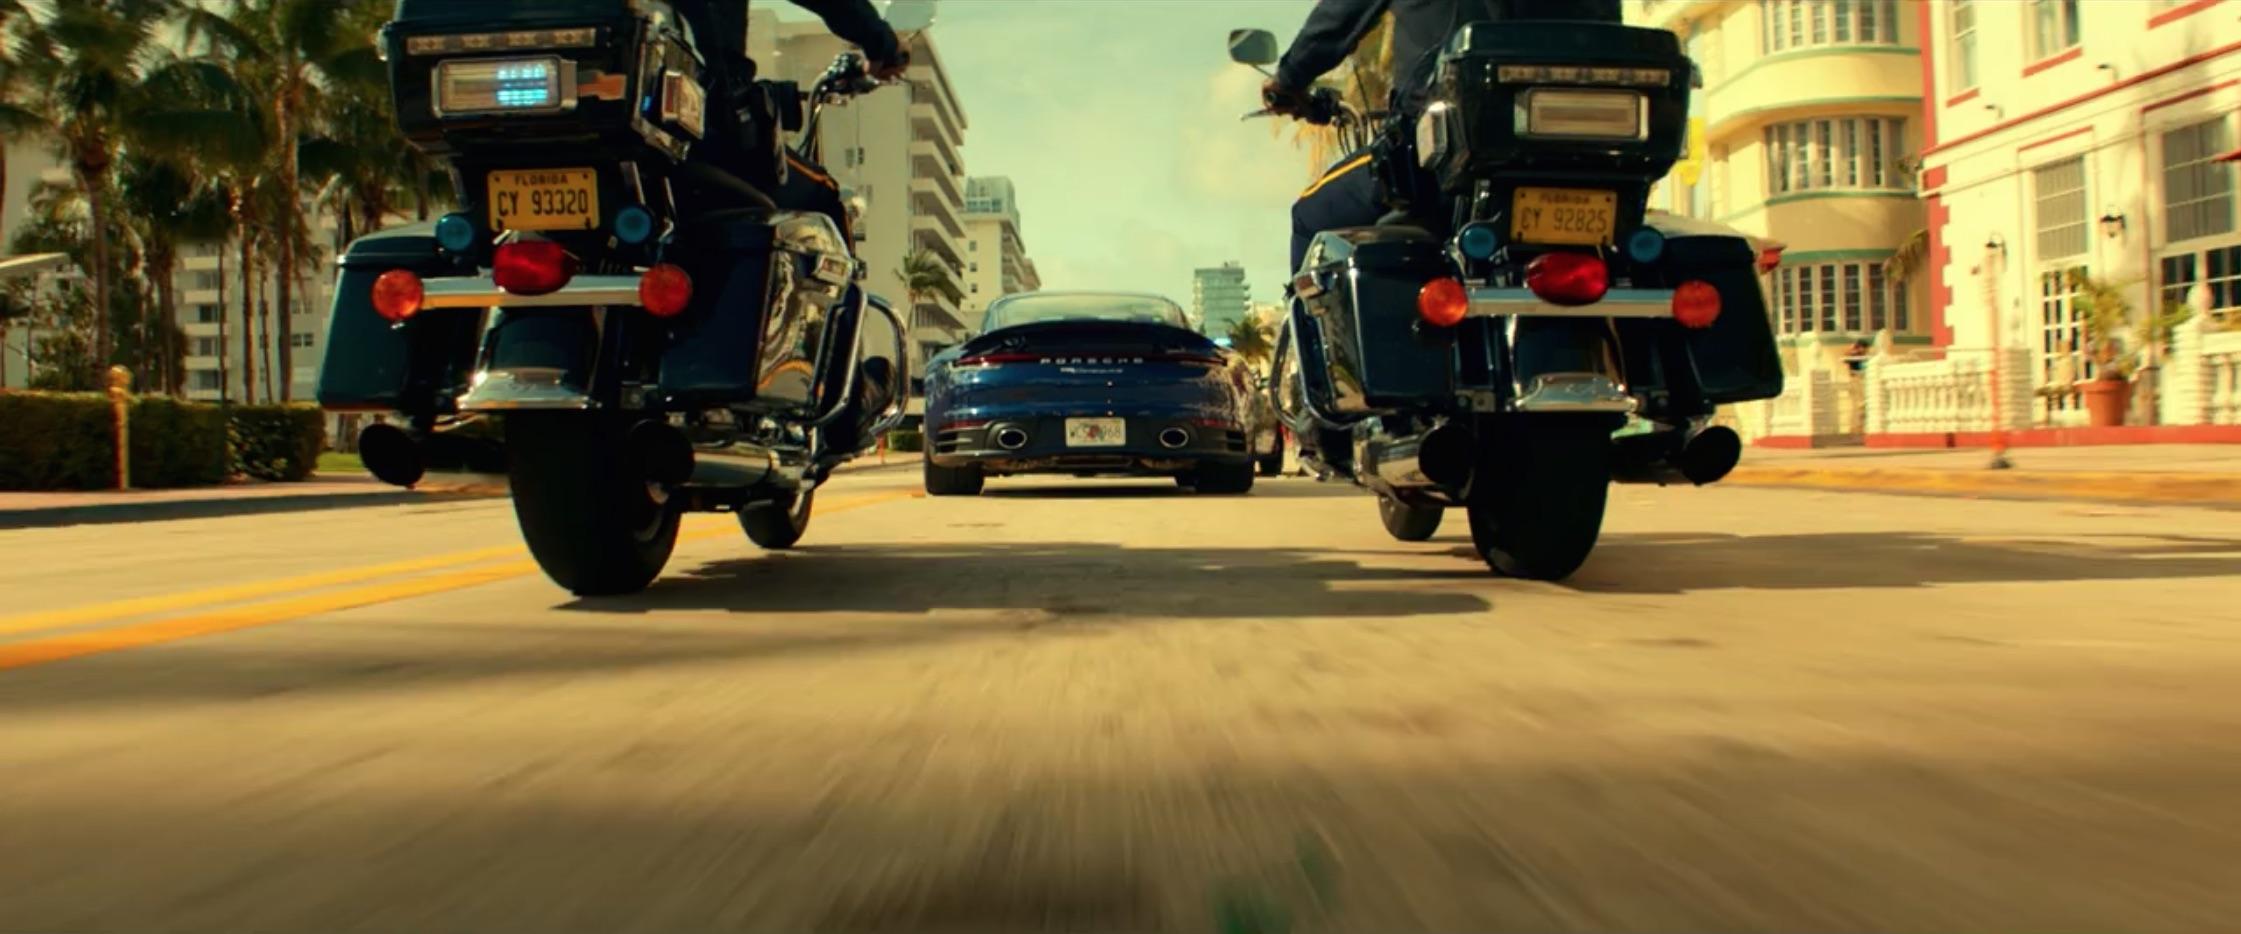 Bad Boys For Life porsche dynamic street action rear bike police behind